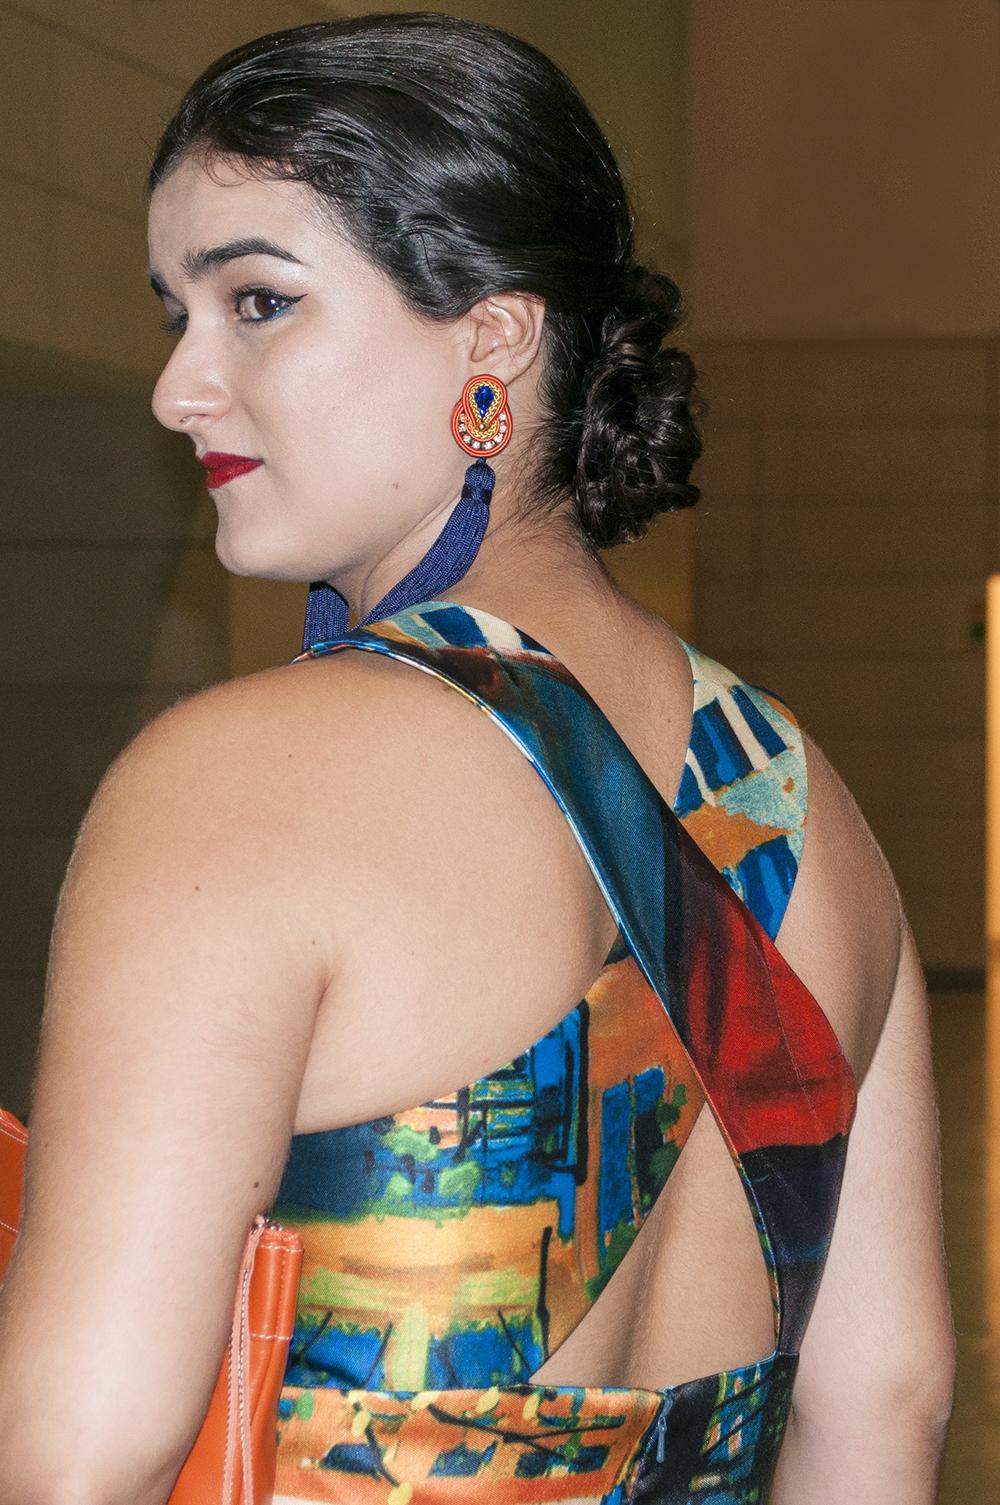 fashion blogger spain somethingfashion valencia graduation college ceremony outfit dress architecture15